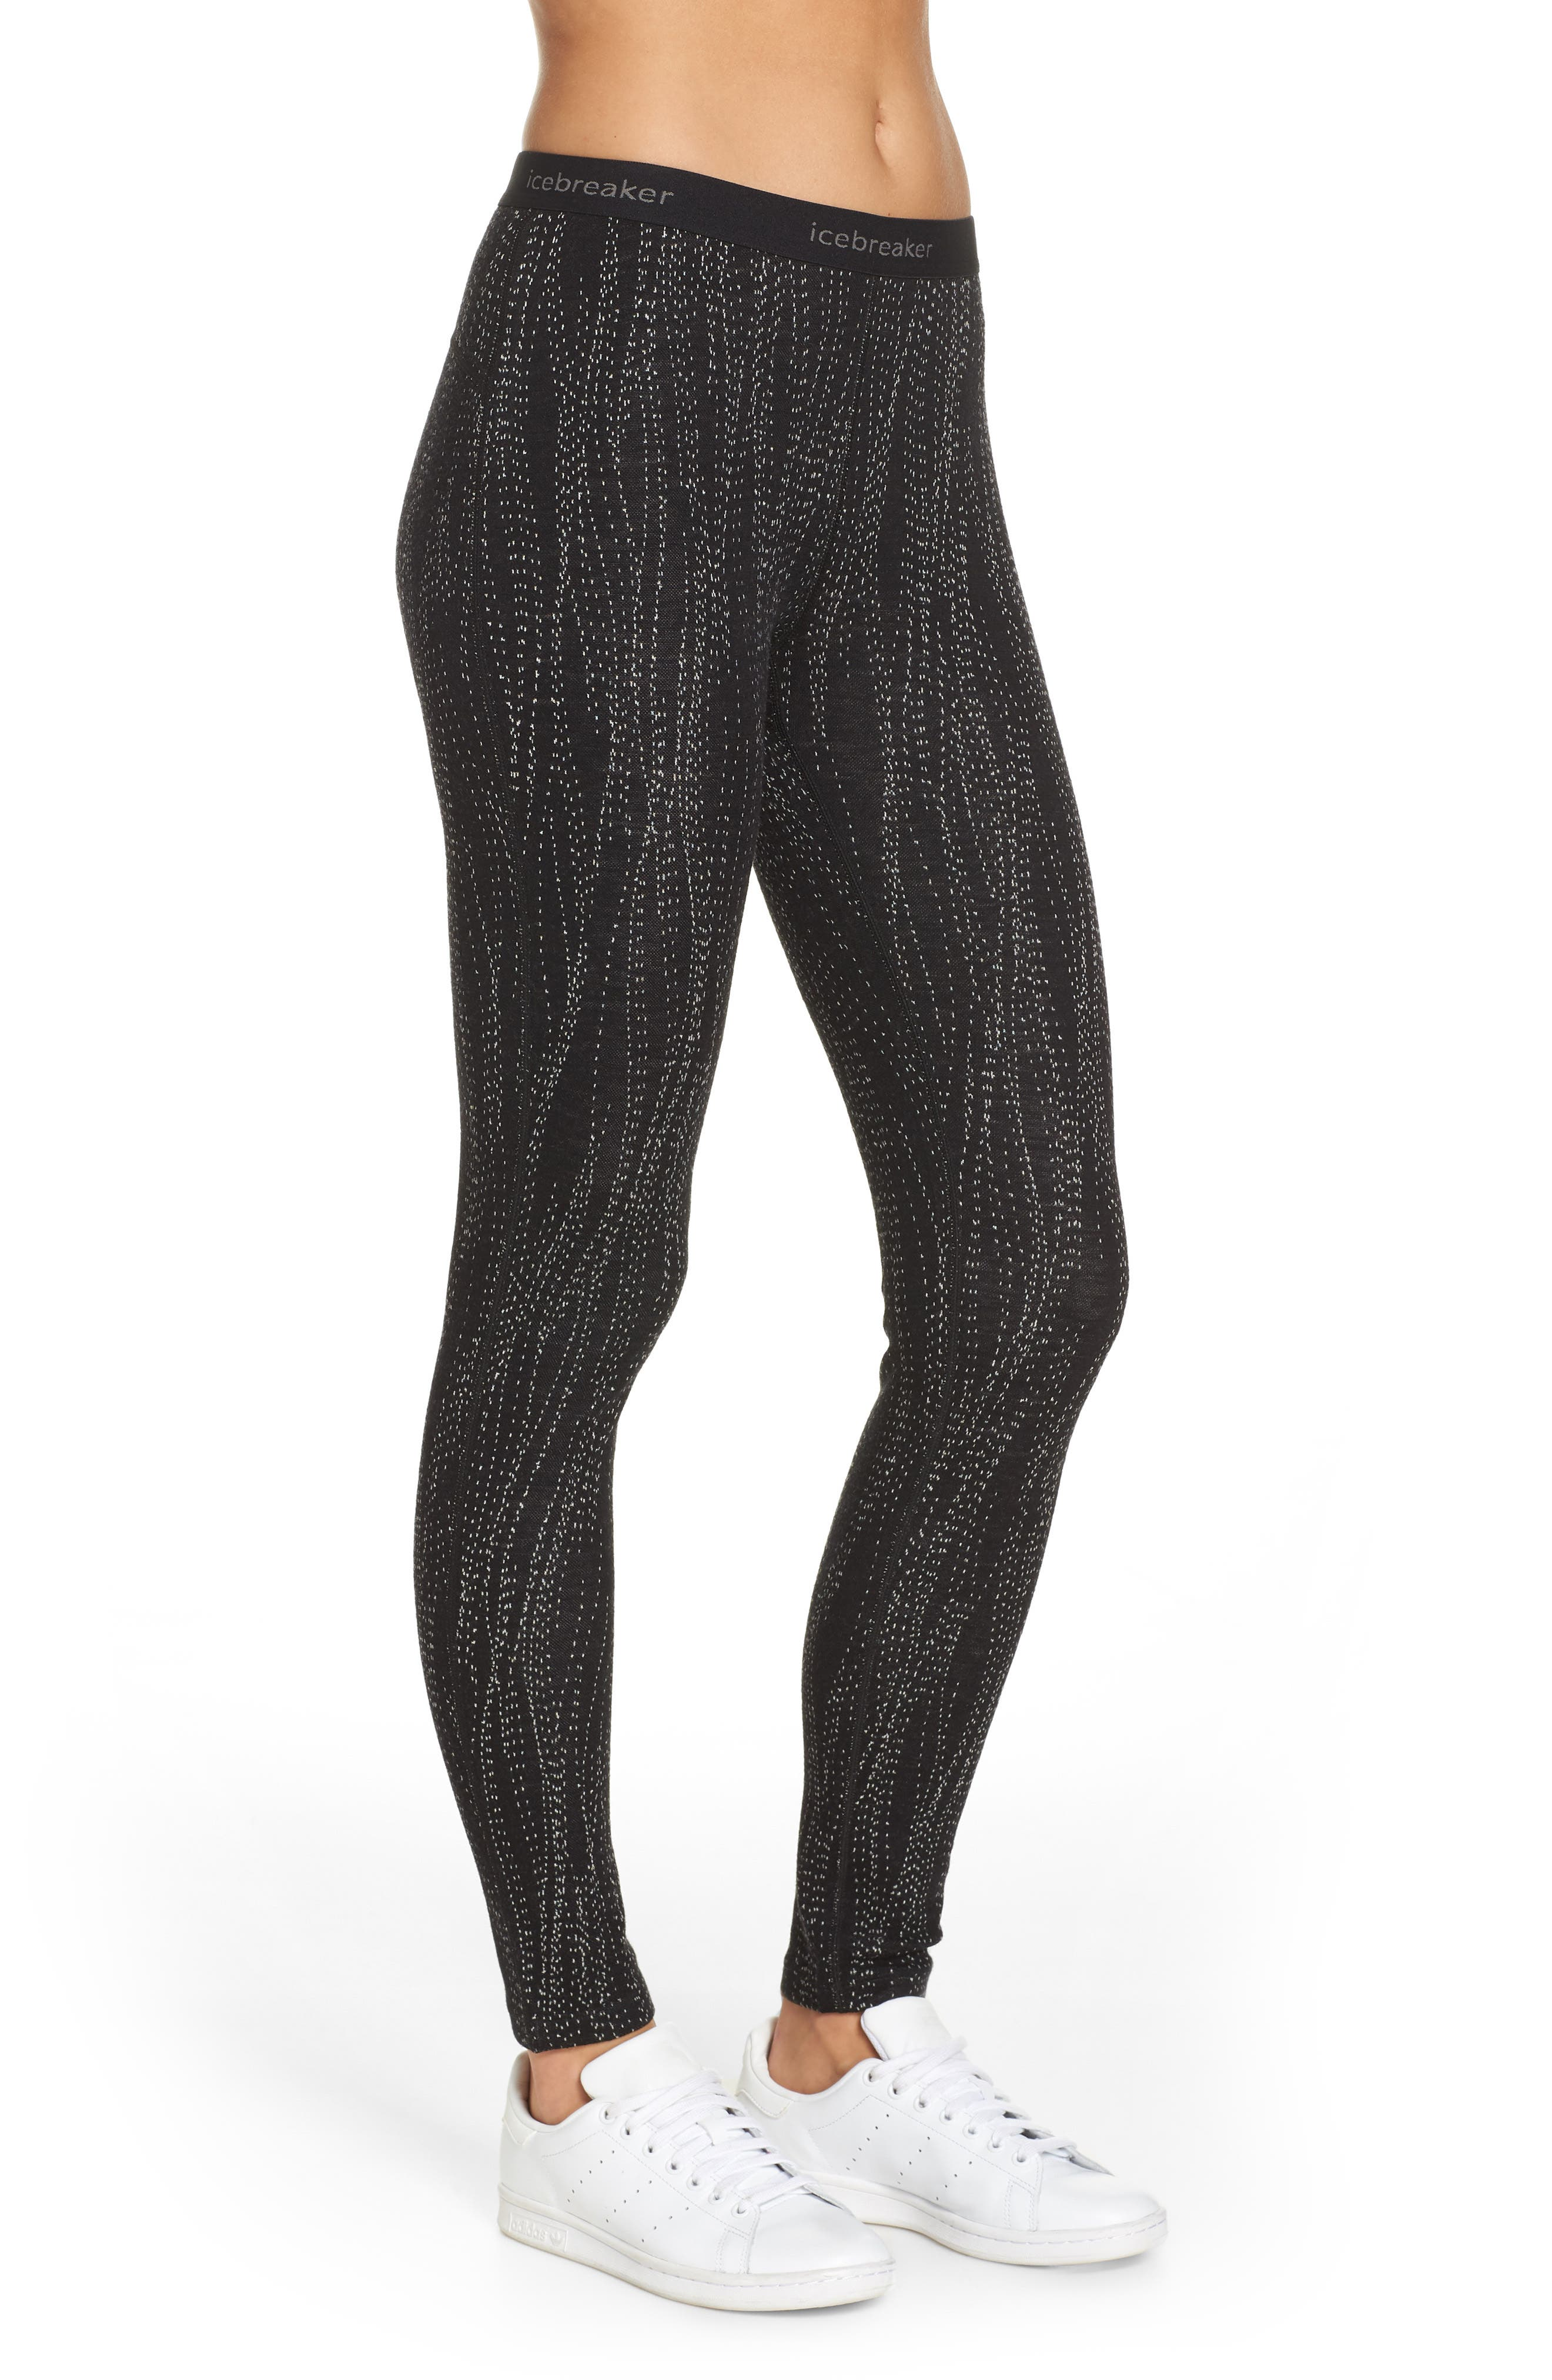 250 Vertex Merino Wool Base Layer Leggings,                             Alternate thumbnail 3, color,                             BLACK/ SNOW